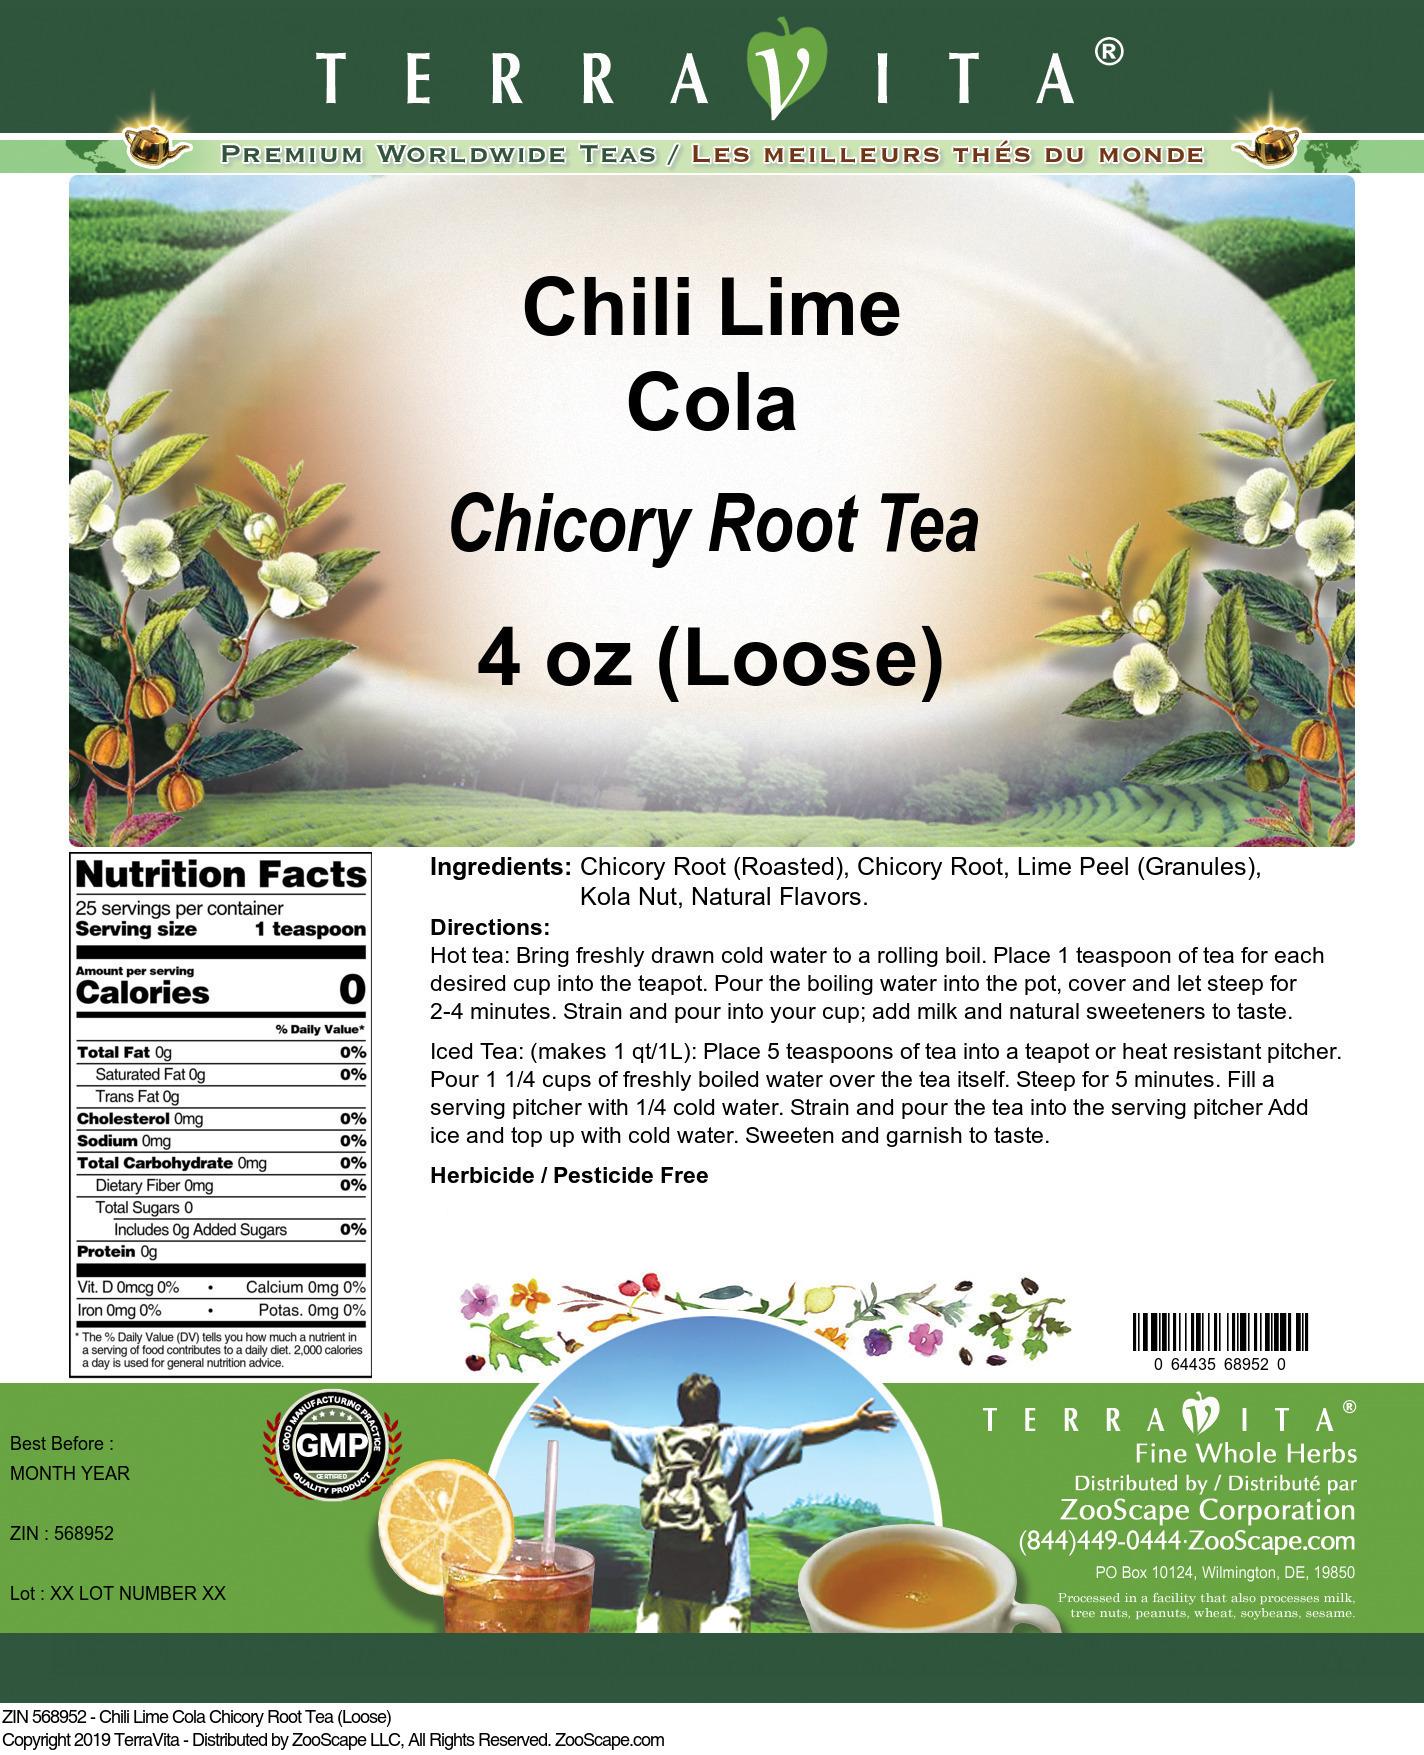 Chili Lime Cola Chicory Root Tea (Loose)